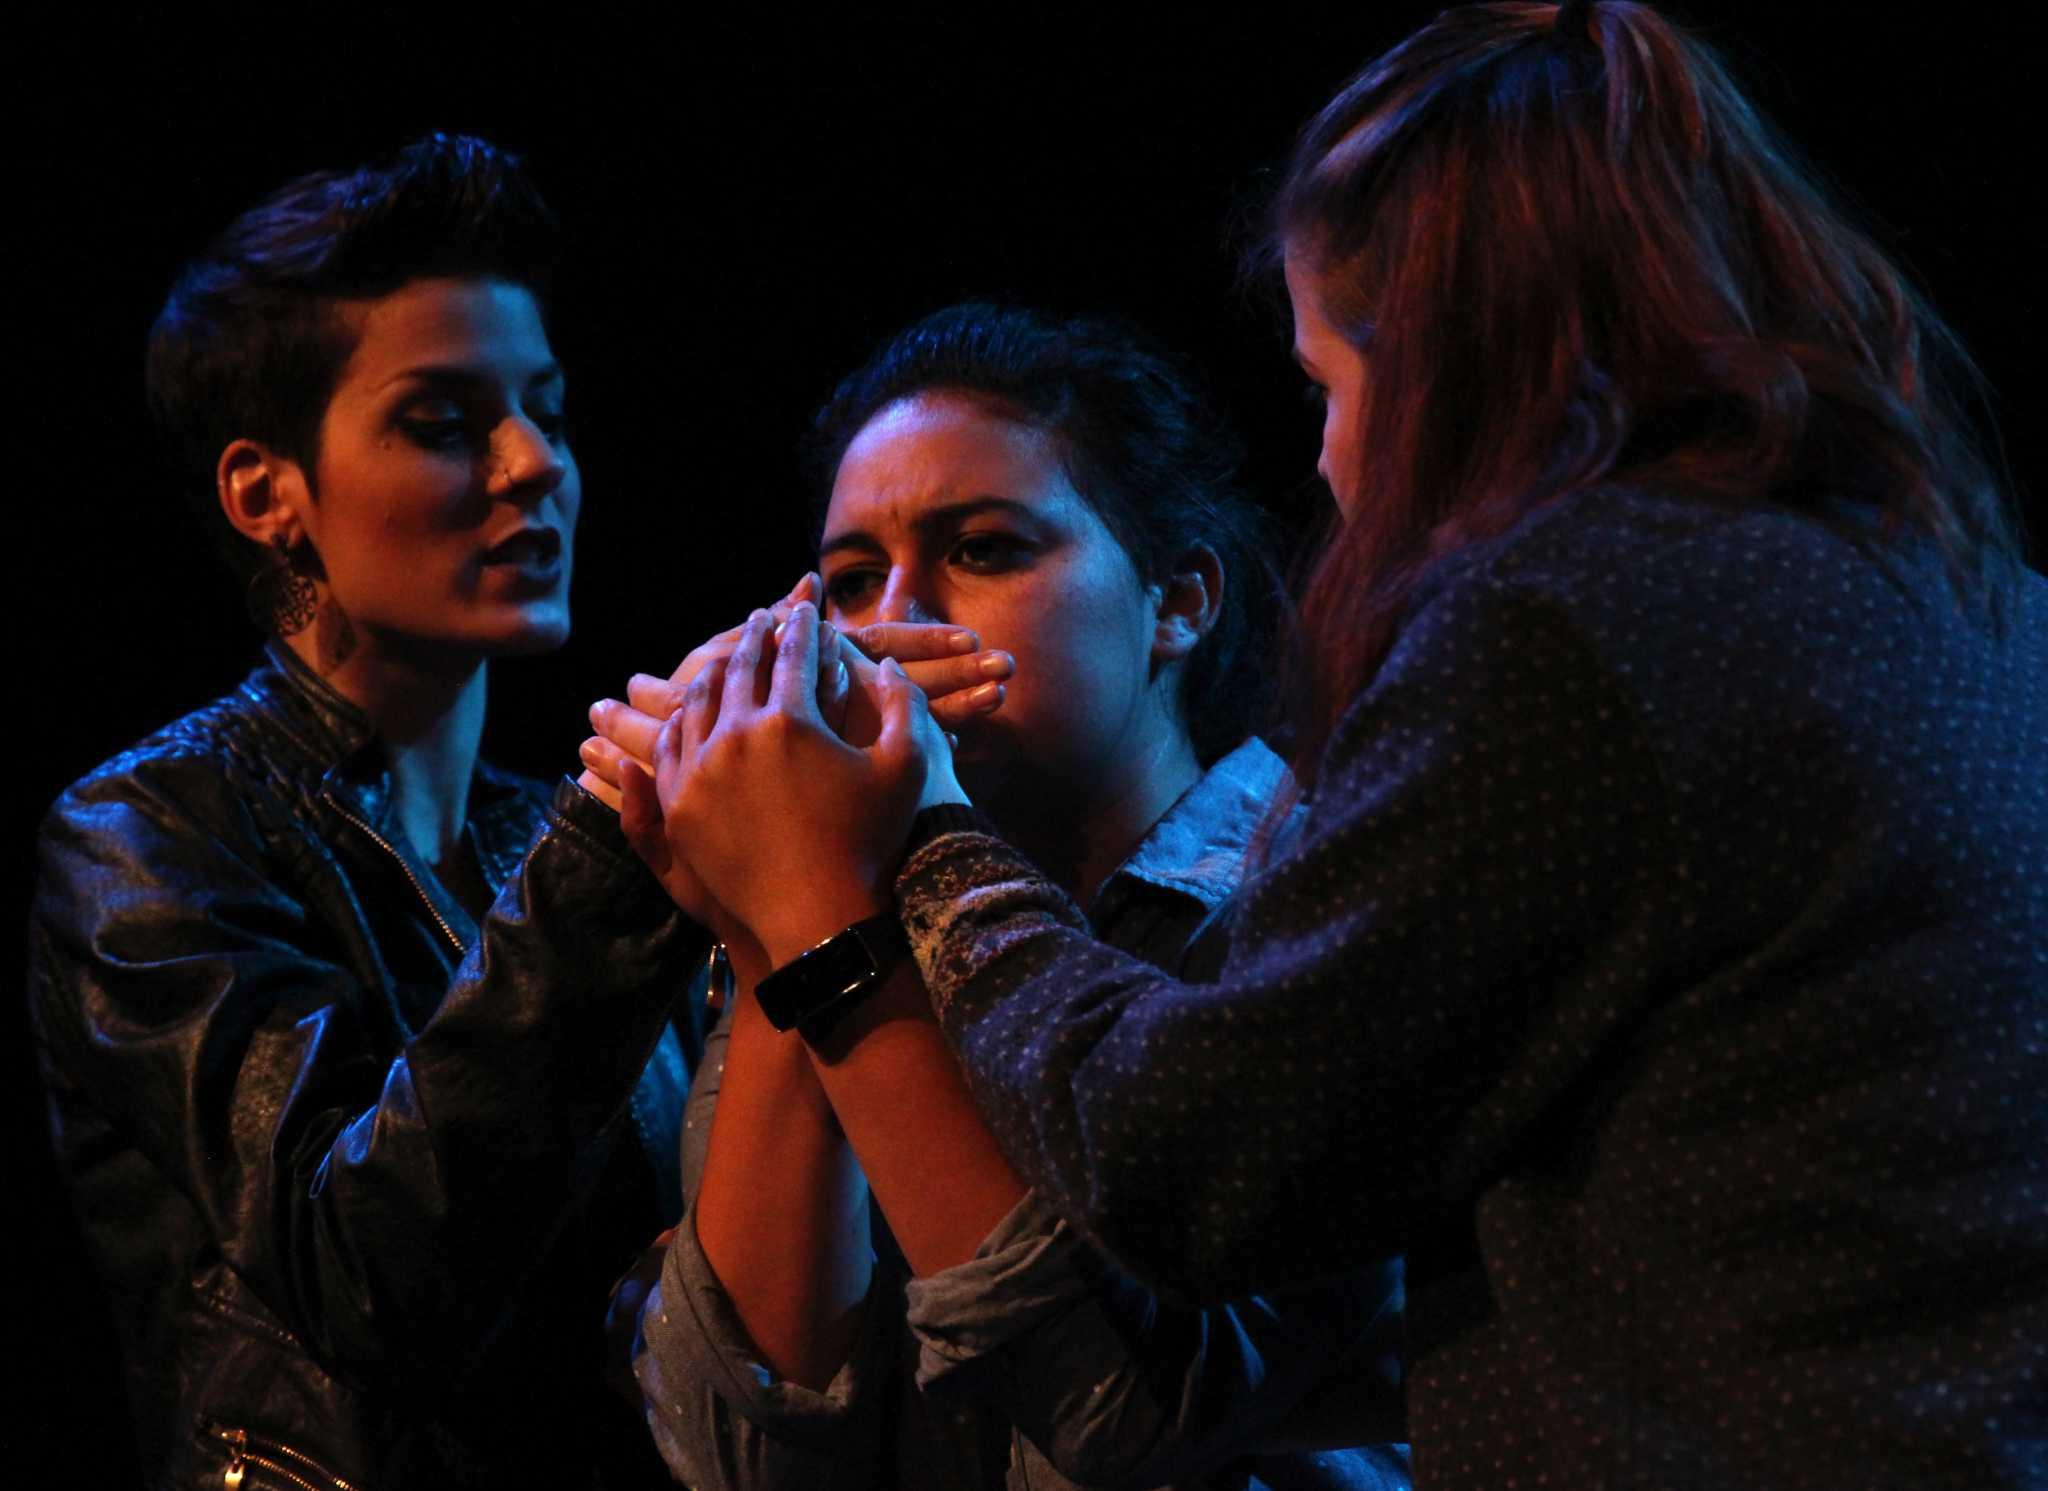 Theater art students Desiree Juanes (left) portraying